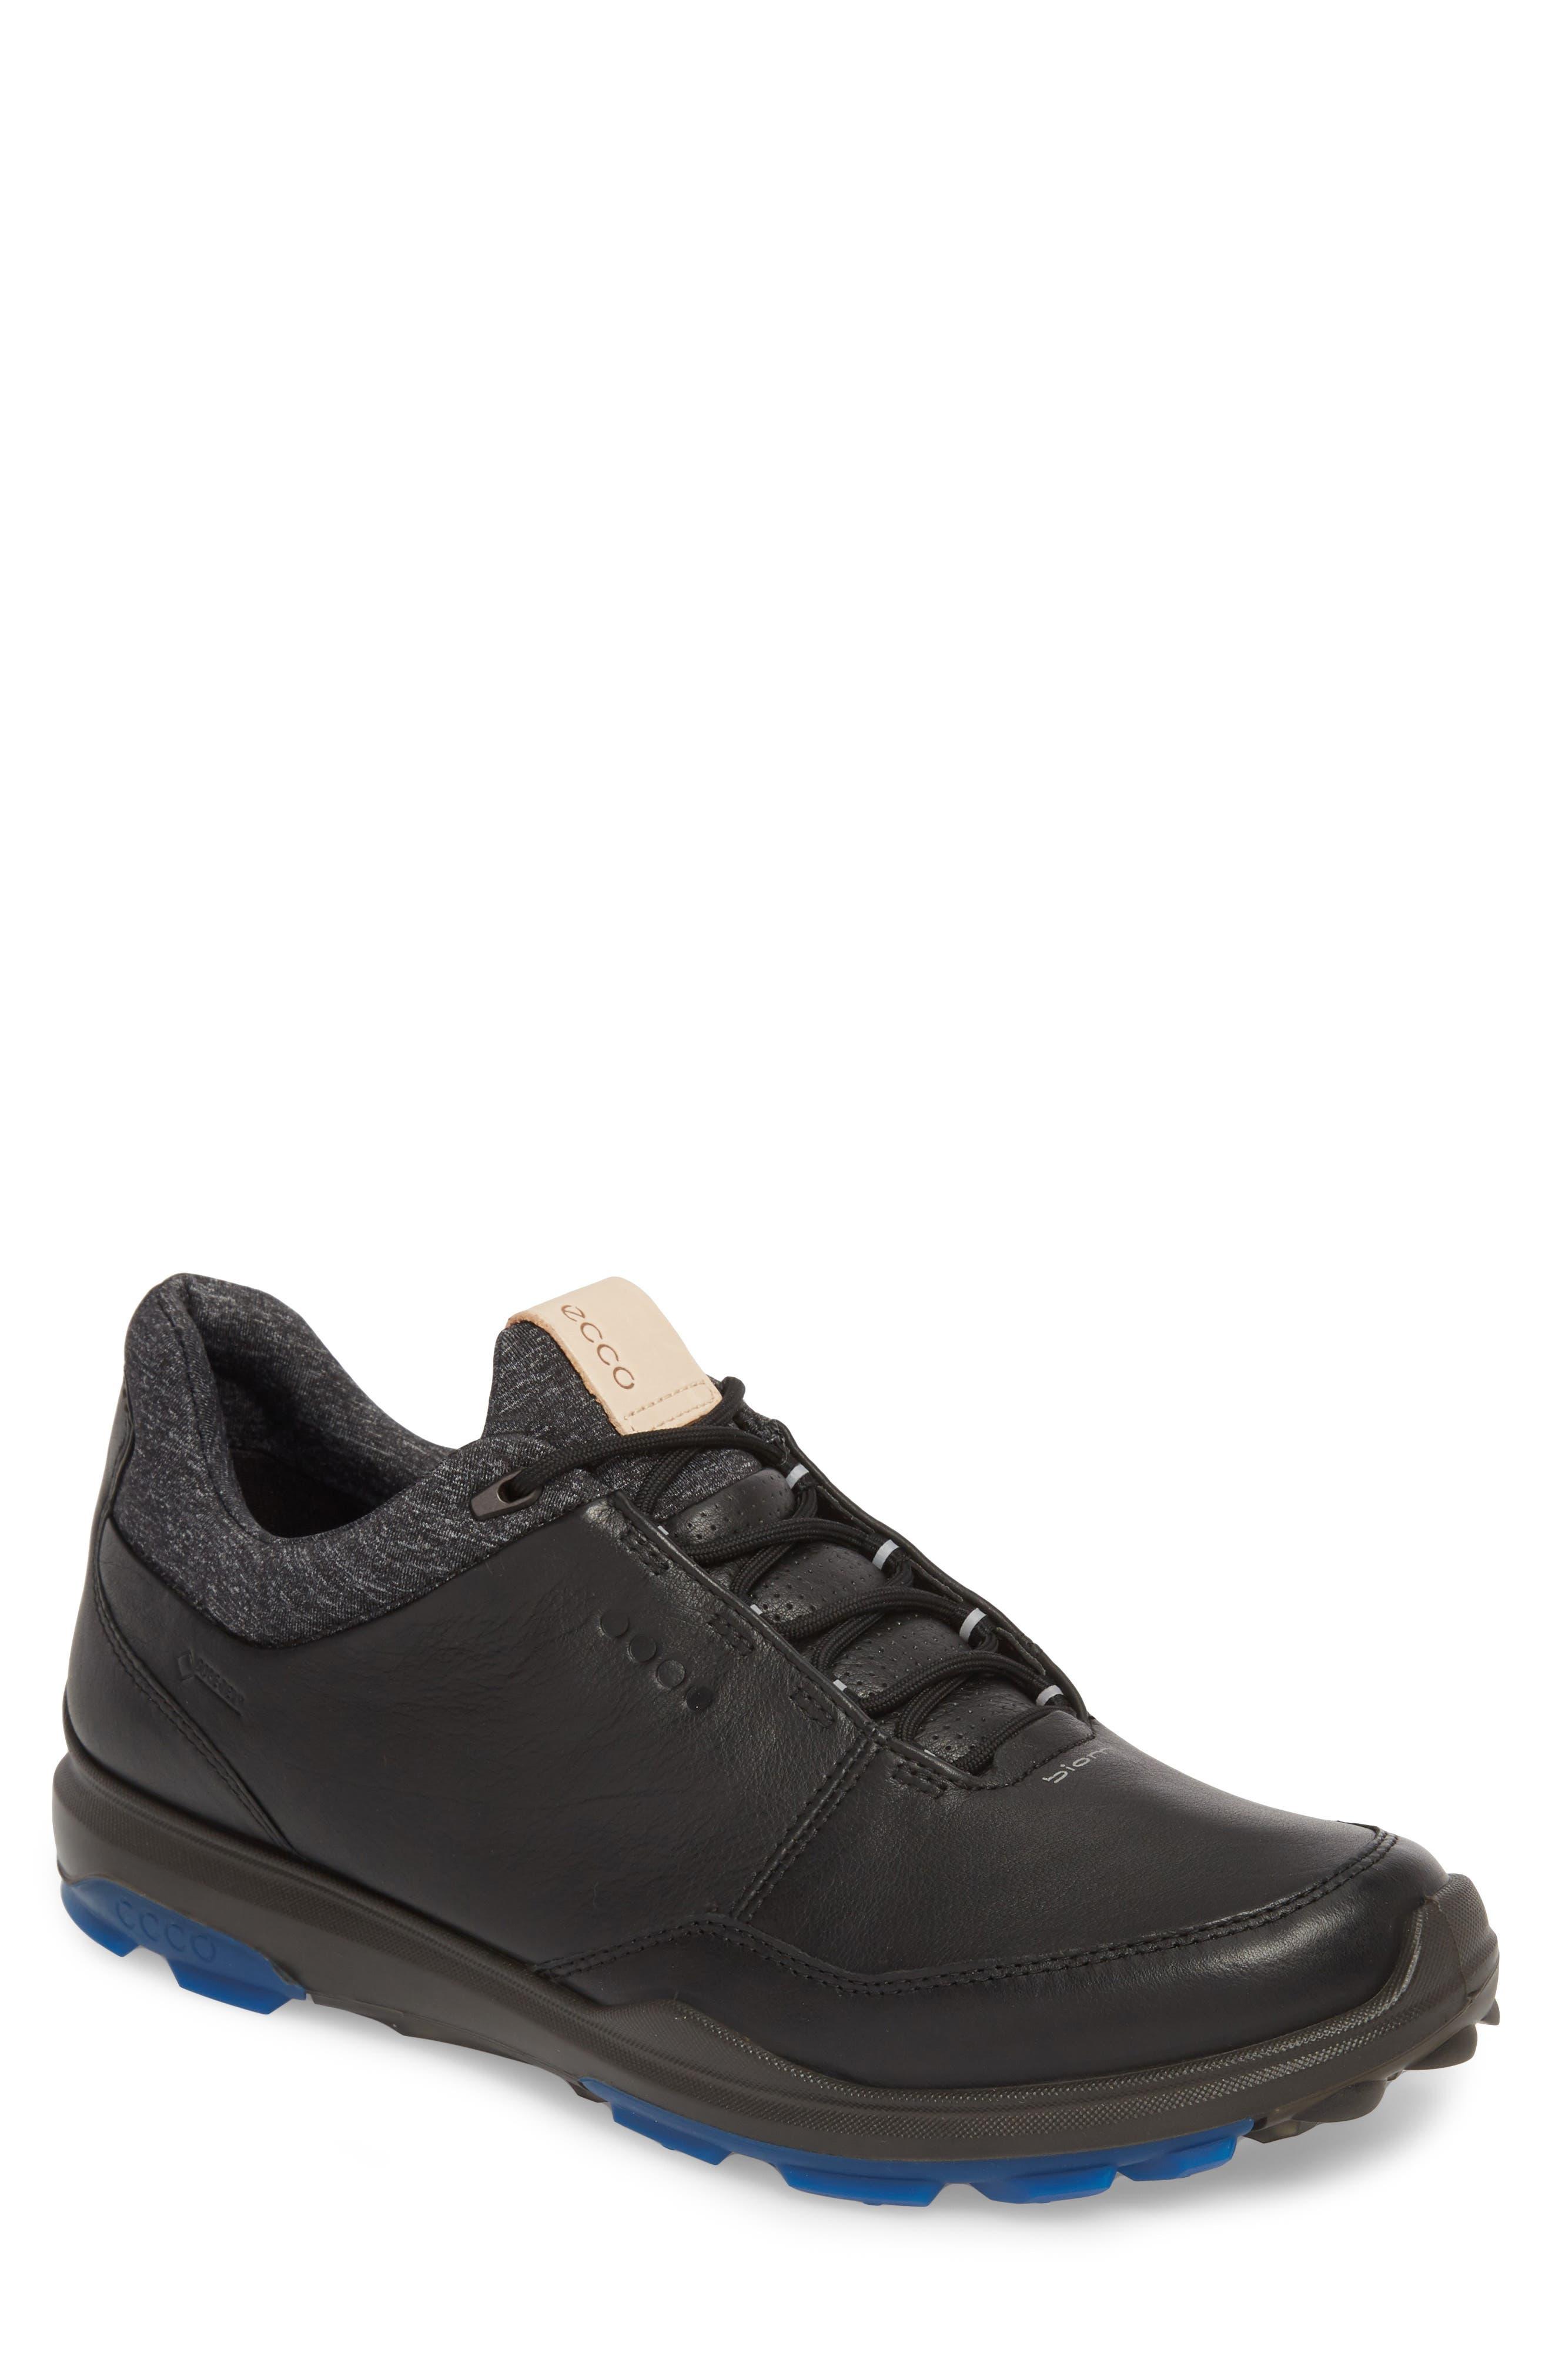 BIOM Hybrid 3 Gore-Tex<sup>®</sup> Golf Shoe,                             Main thumbnail 1, color,                             Black/ Bermuda Blue Leather